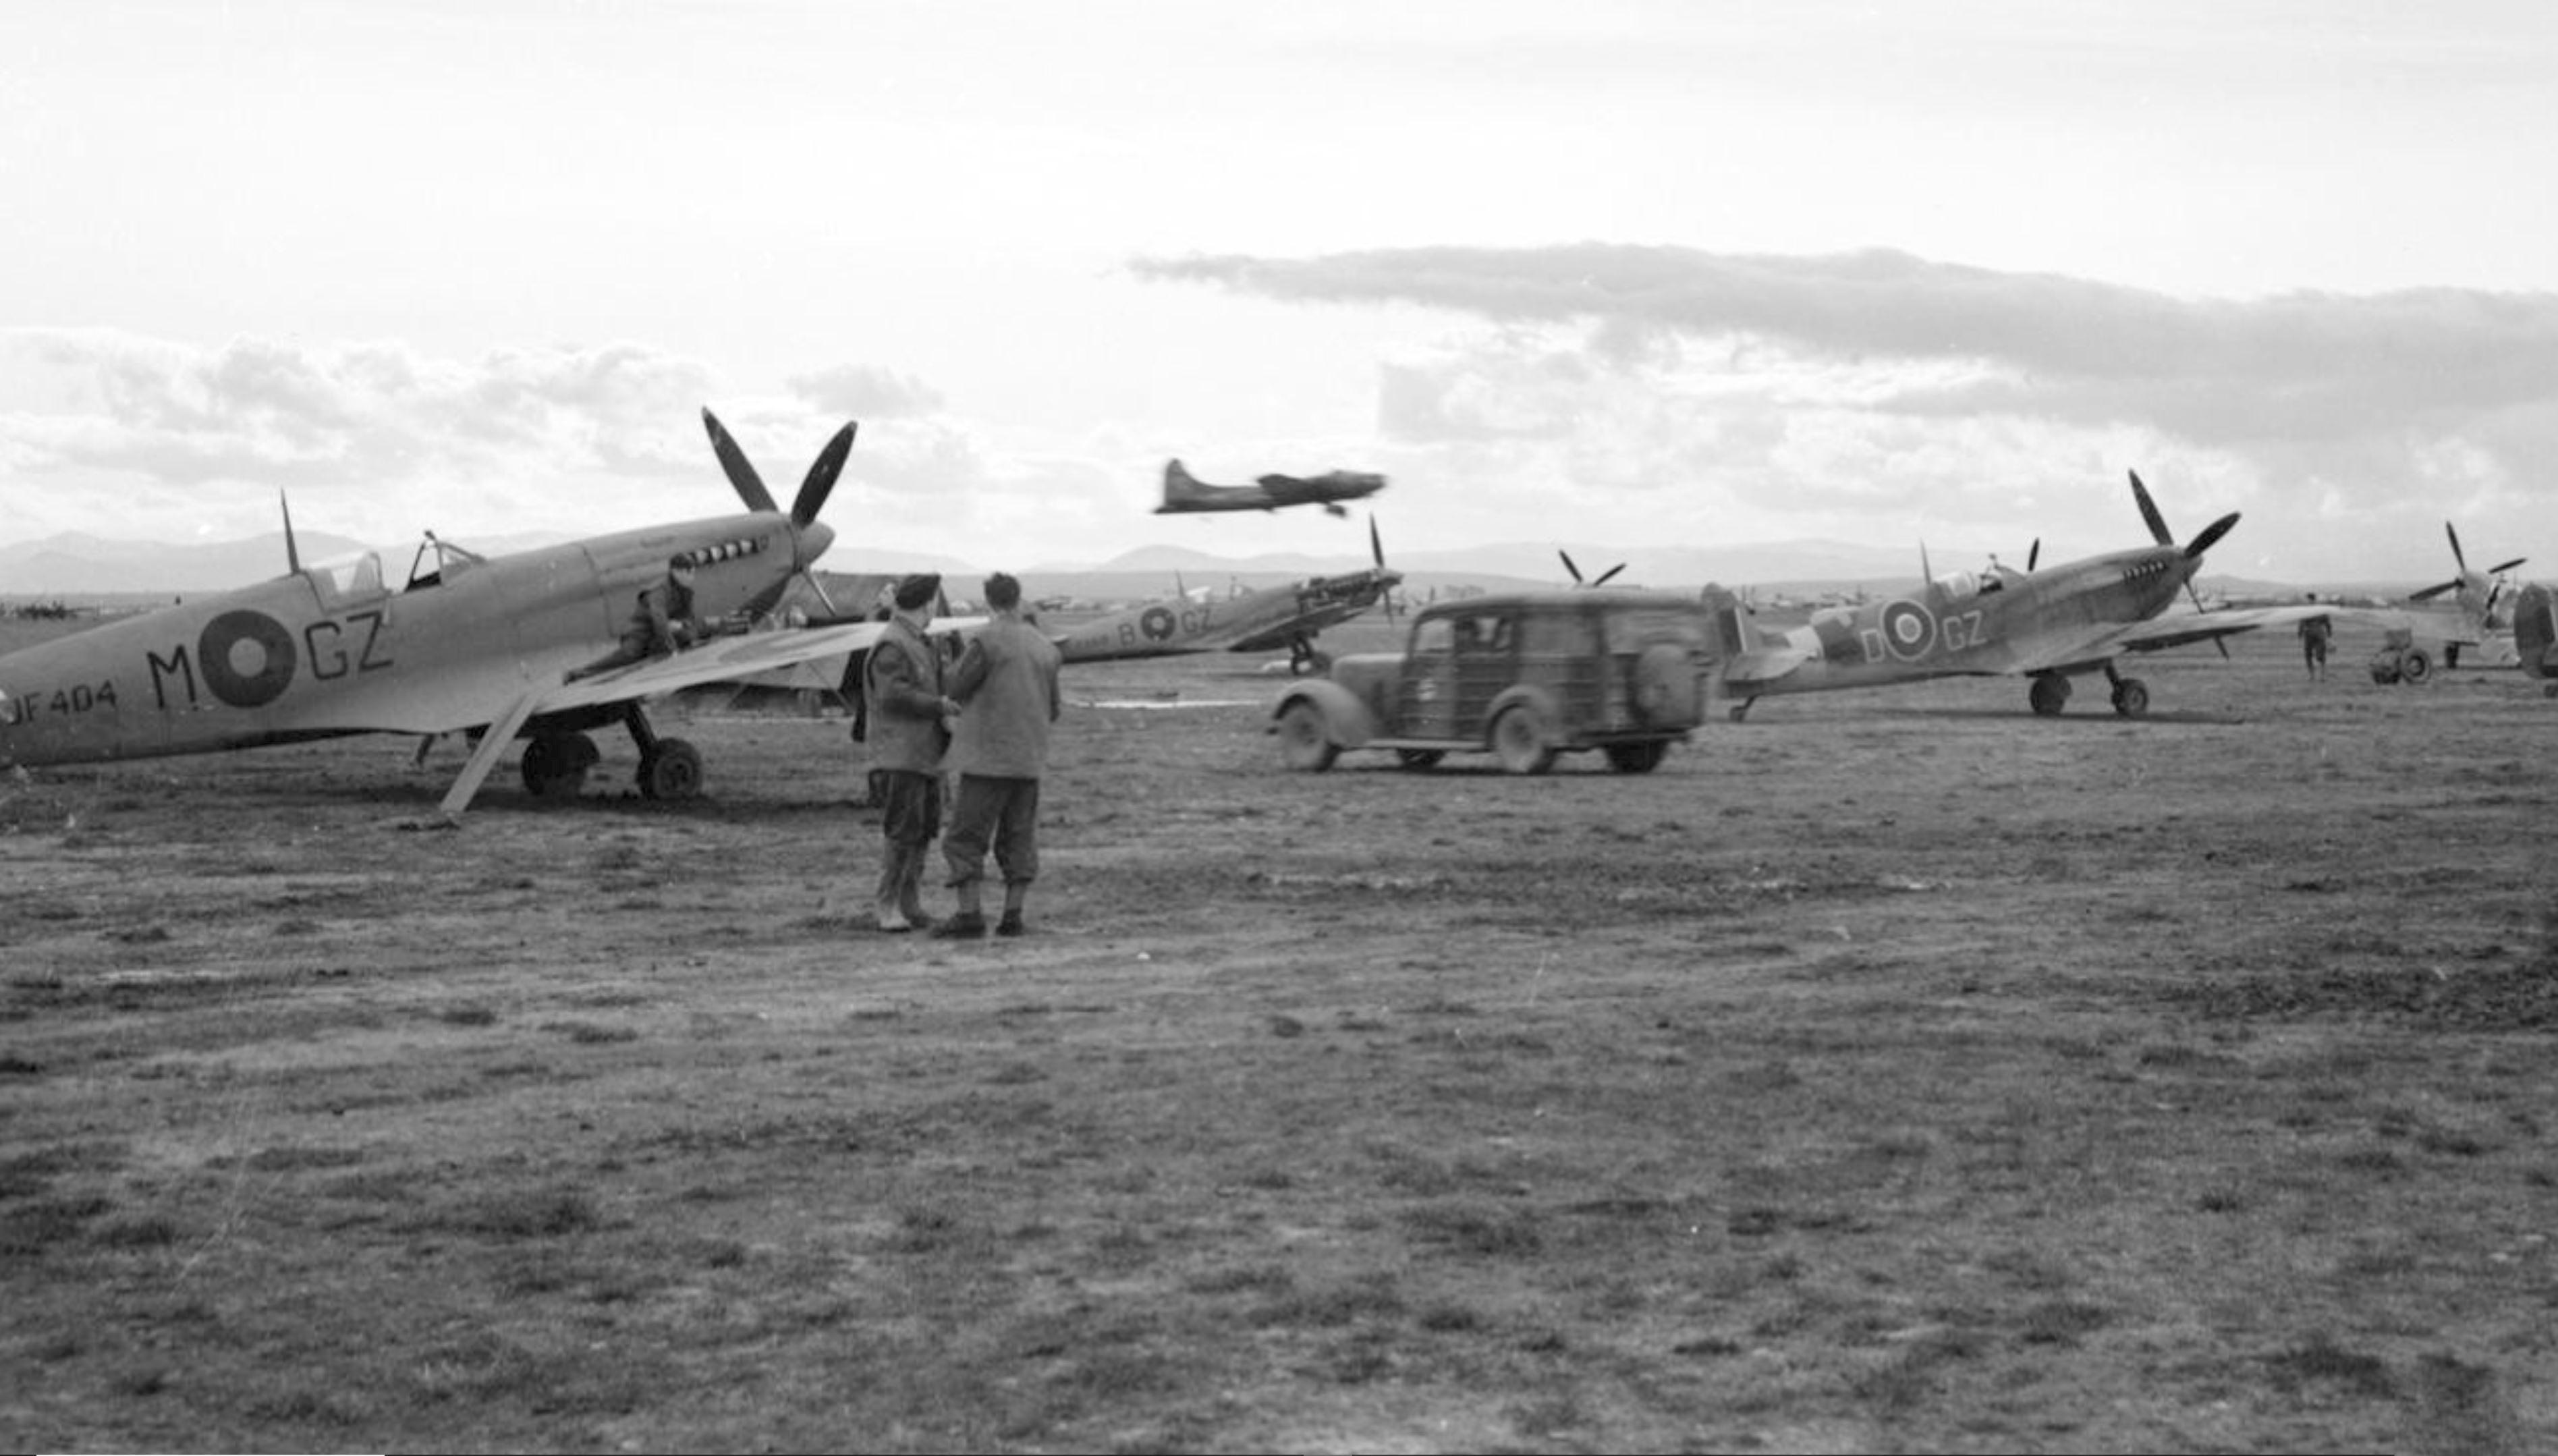 Spitfire MkVIII RAF 32Sqn GZM JF404 and HFIX GZB MA619 GZD at Foggia Italy 1943 IWM CNA2663